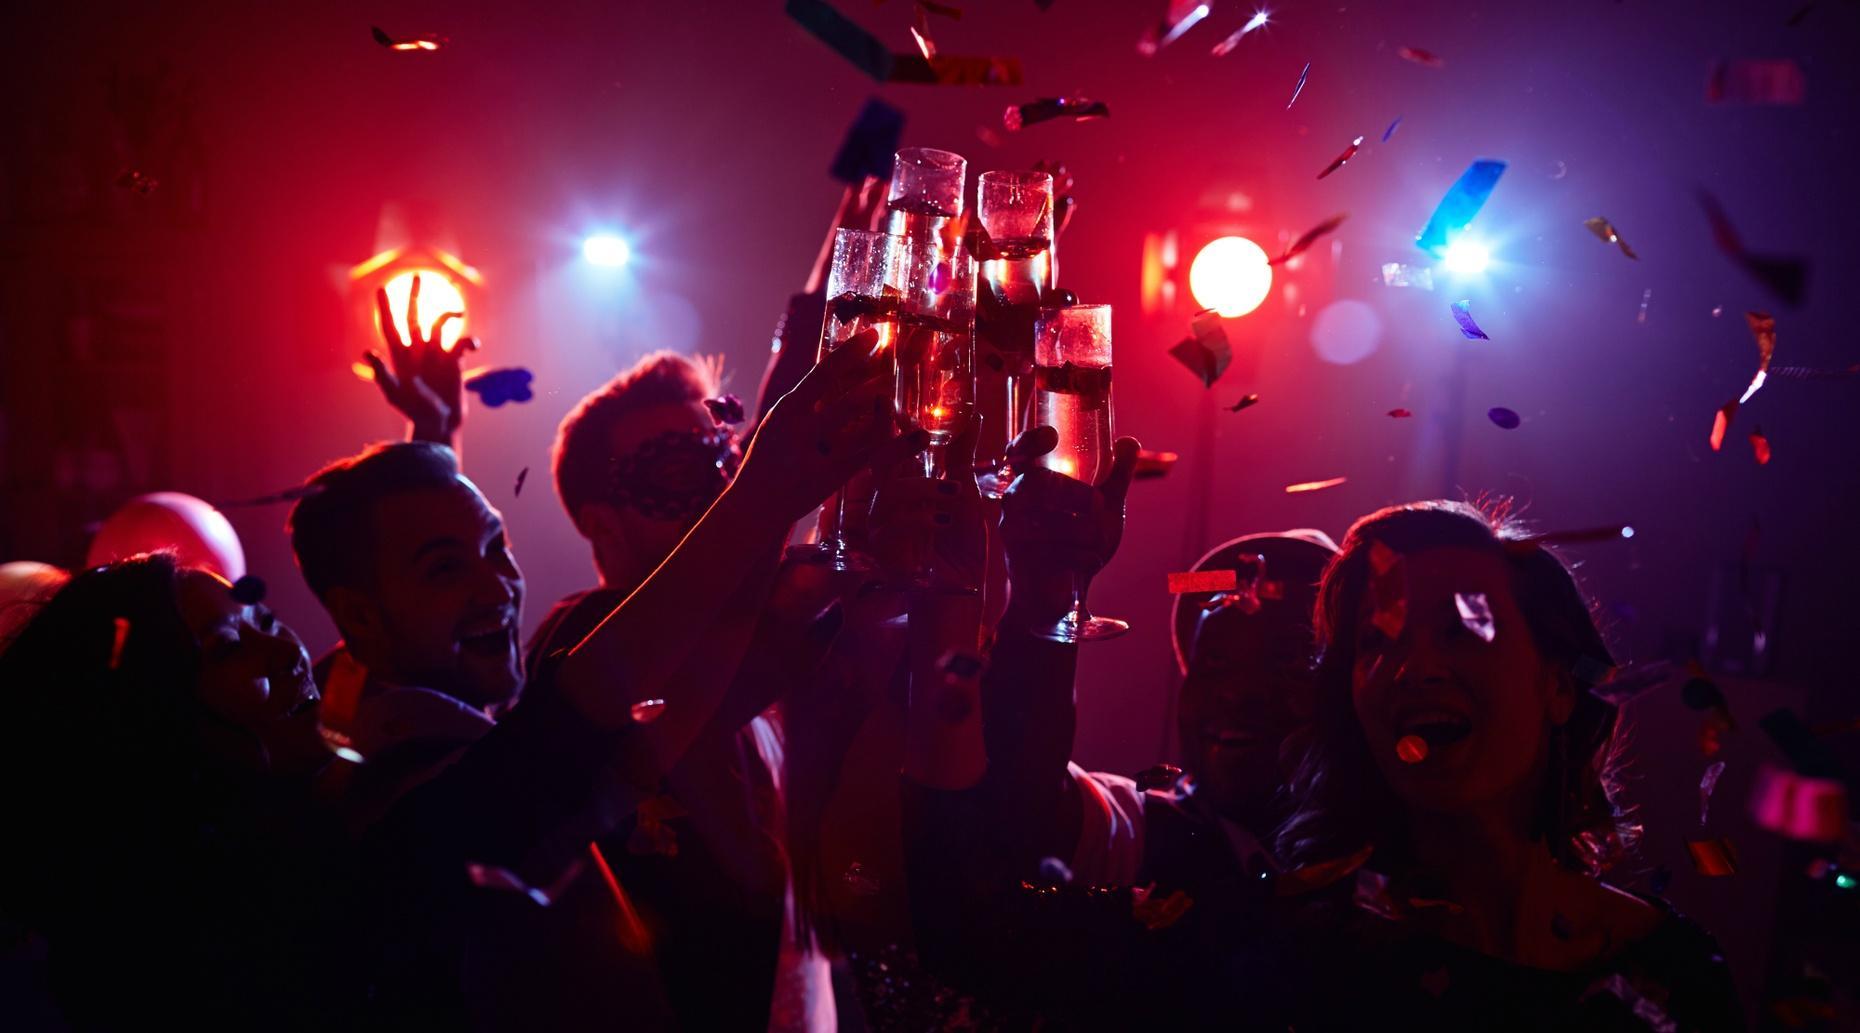 LIV Nightclub VIP Package